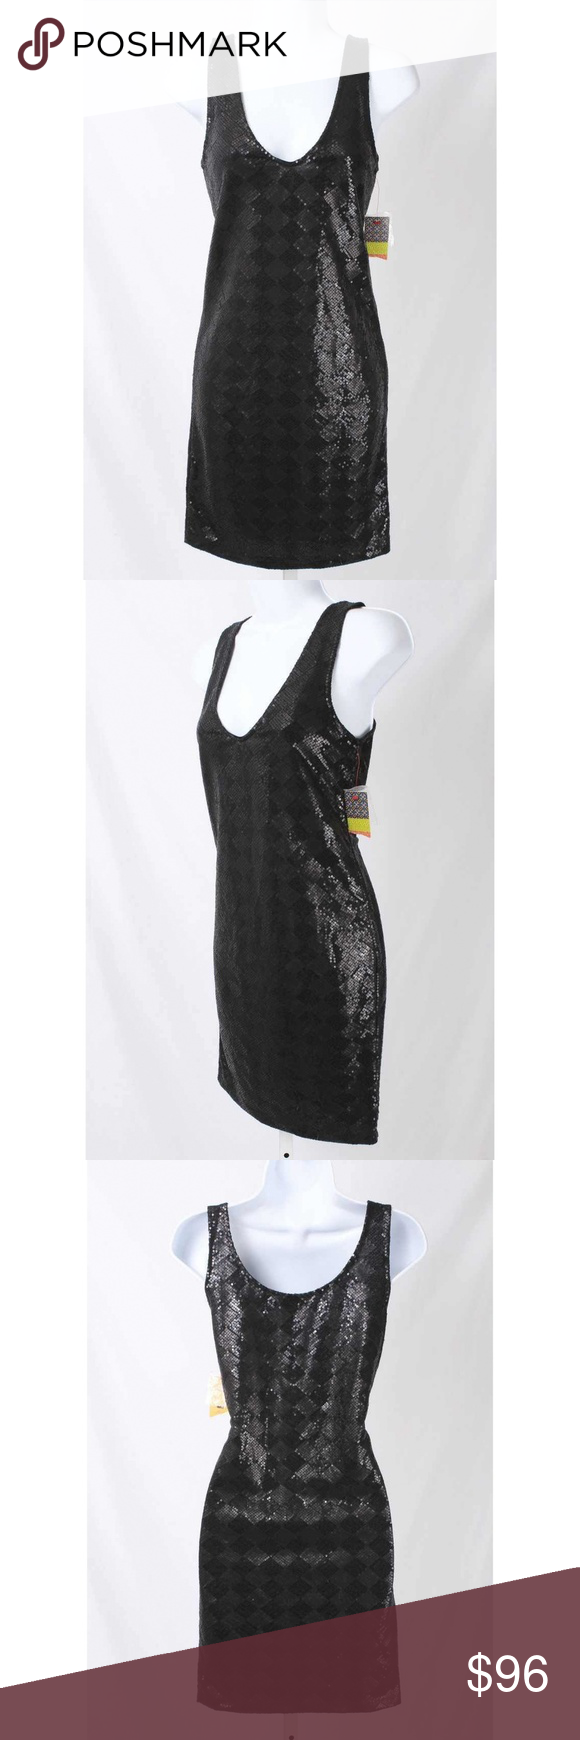 Tory burch black diamond pattern sequin dress nwt nwt pinterest